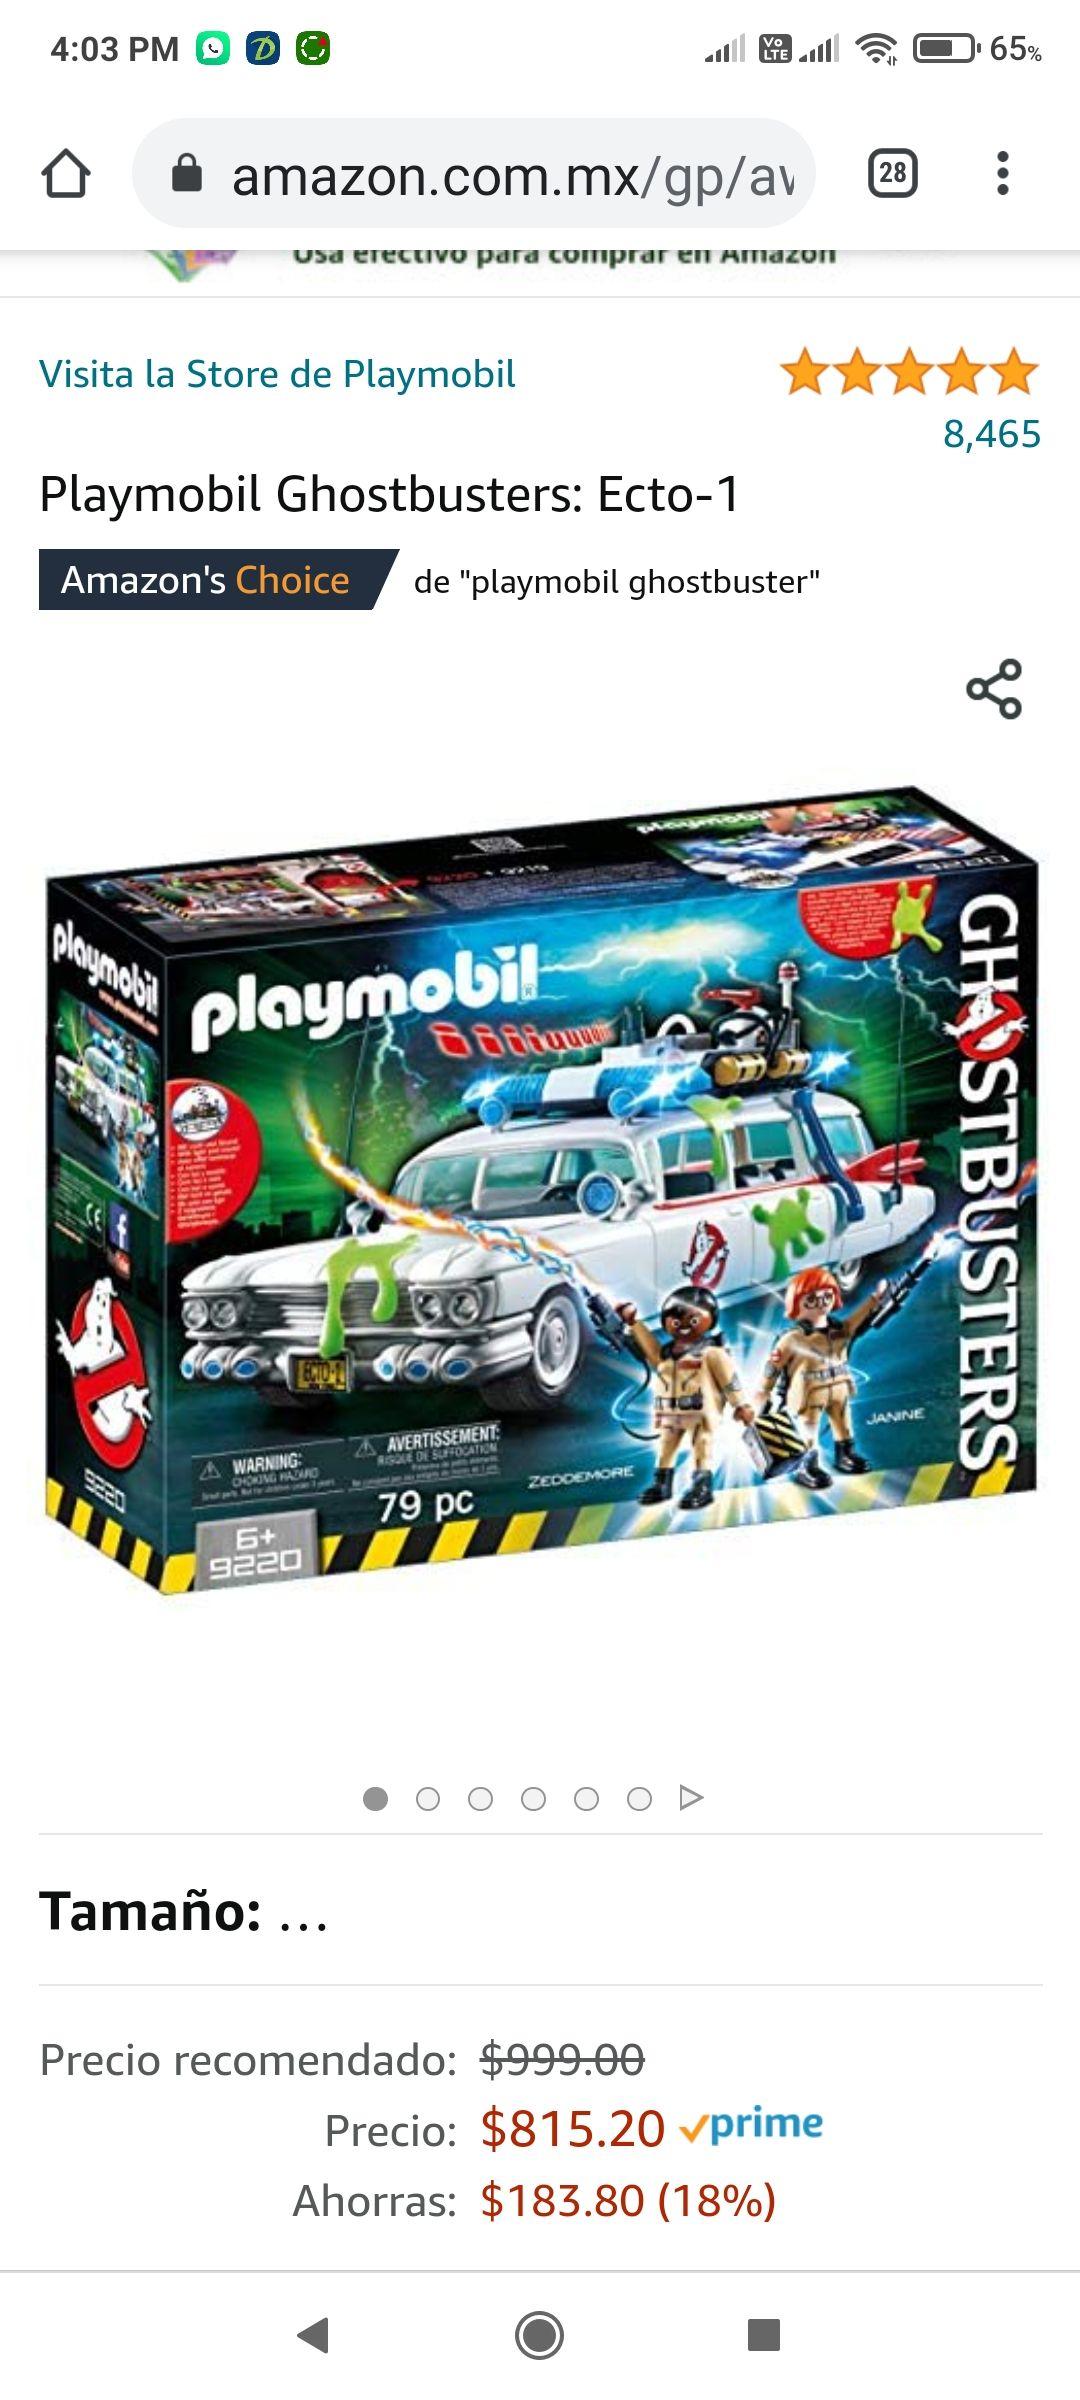 Amazon: Playmobil Ghostbusters: Ecto-1